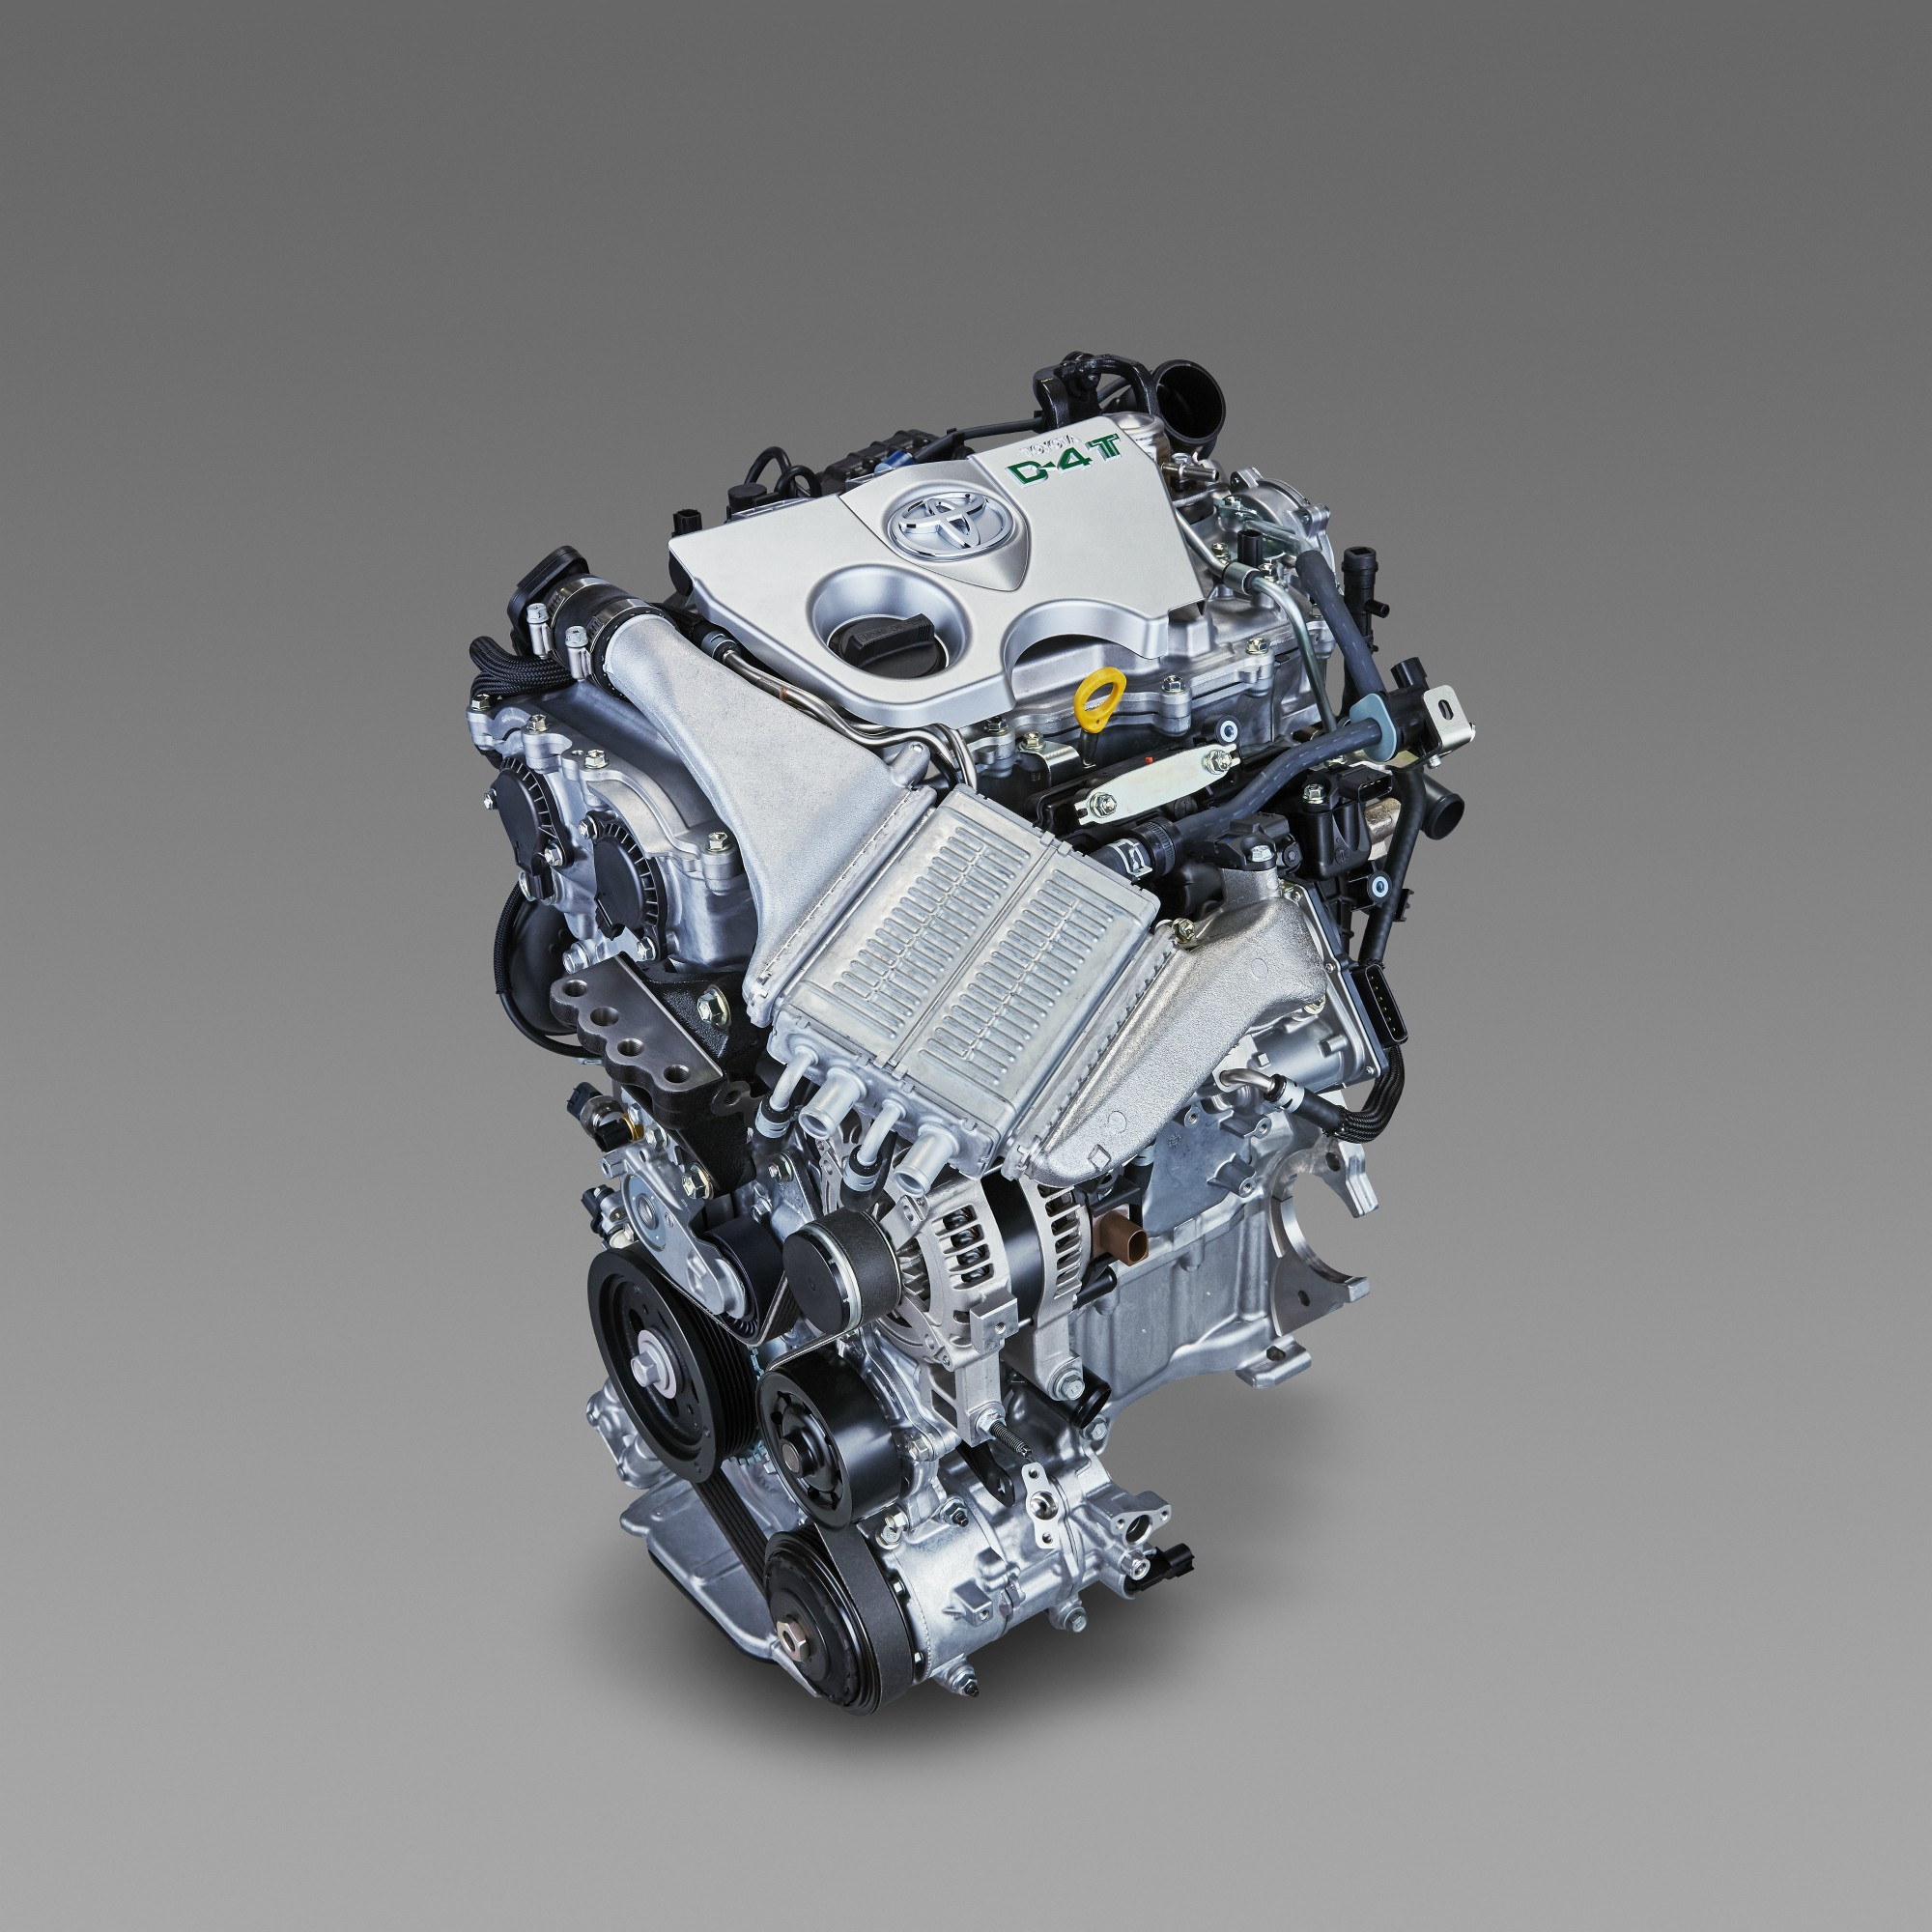 Toyota 8NR-FTS 1.2L Turbo Engine Detailed - autoevolution